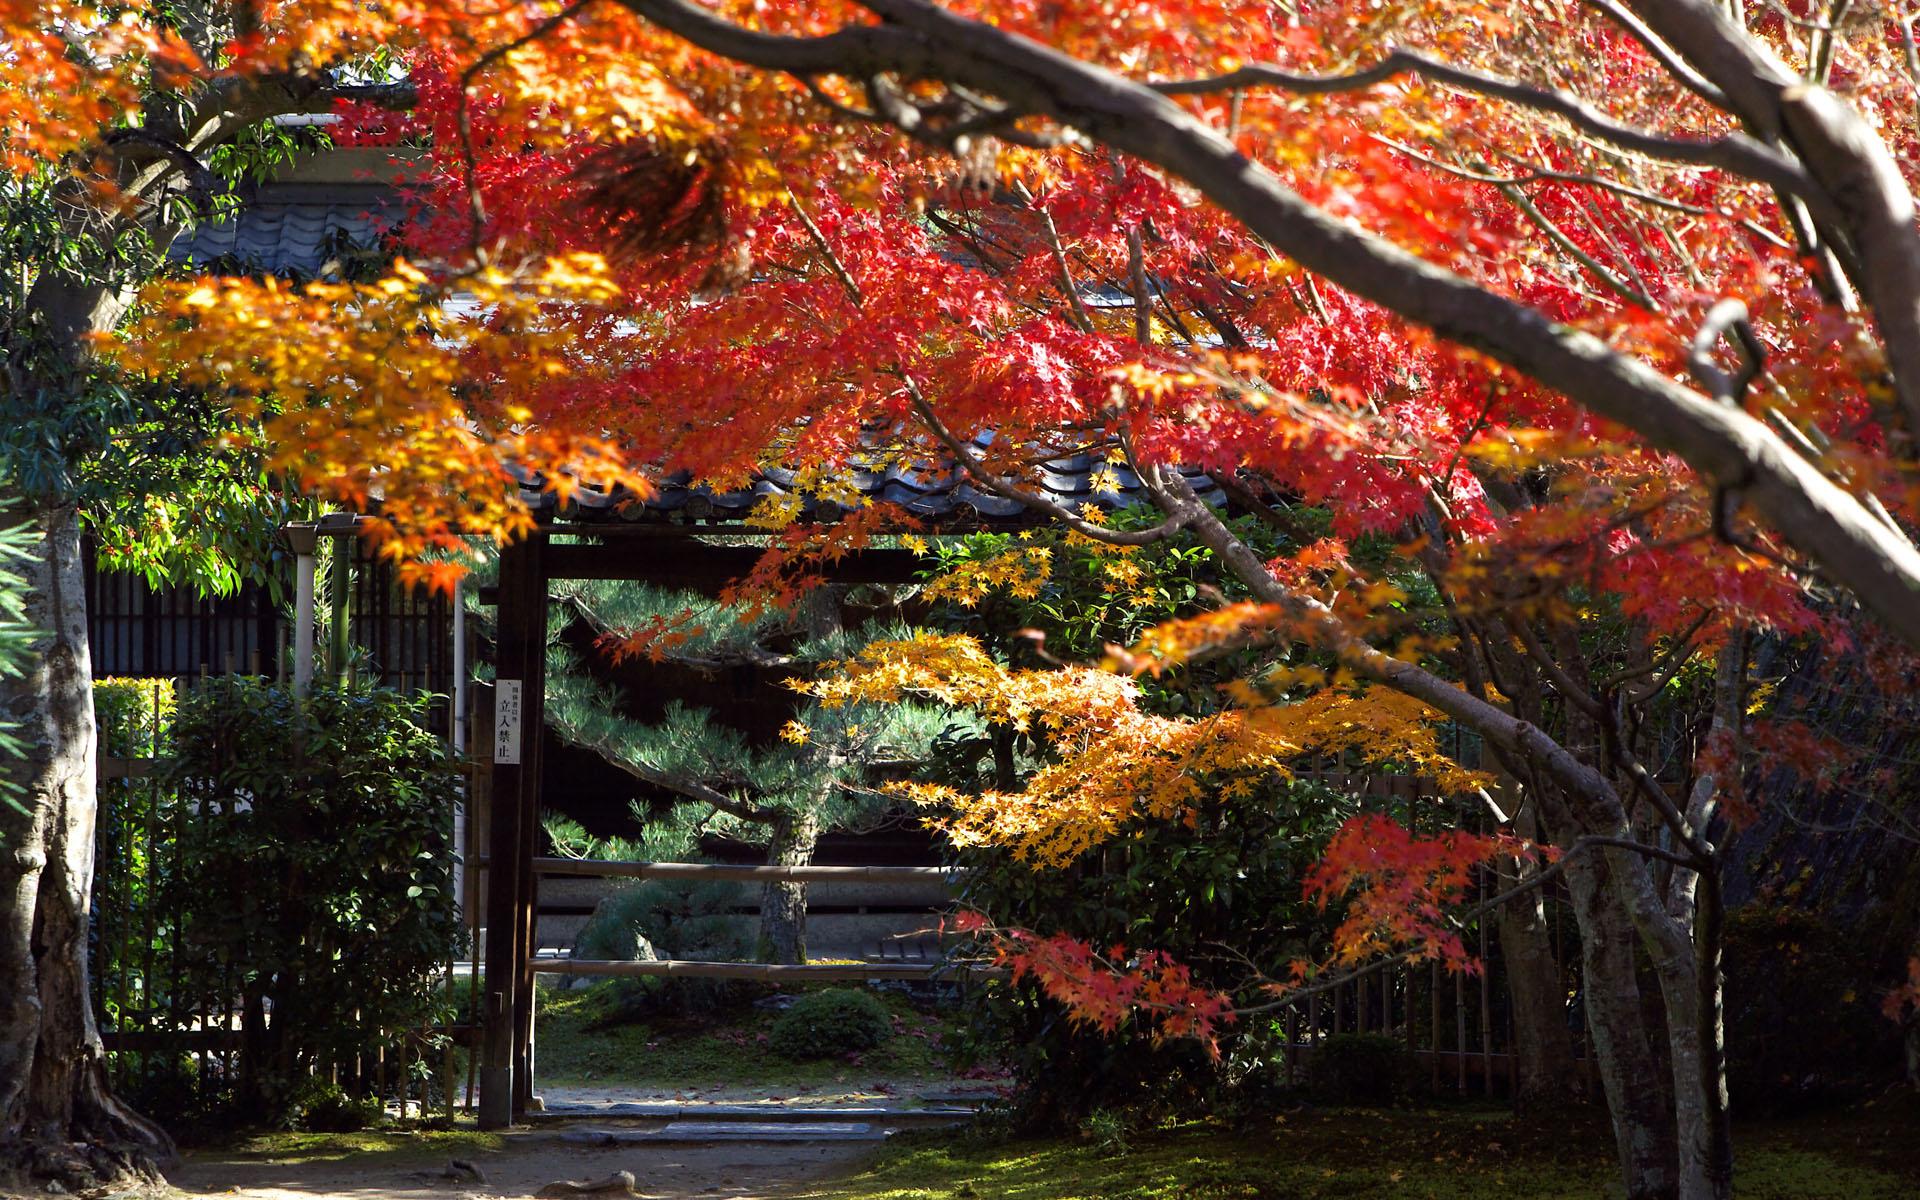 Hd wallpaper japan - Japan Wallpapers Widescreen Hd Wallpaper Background Desktop